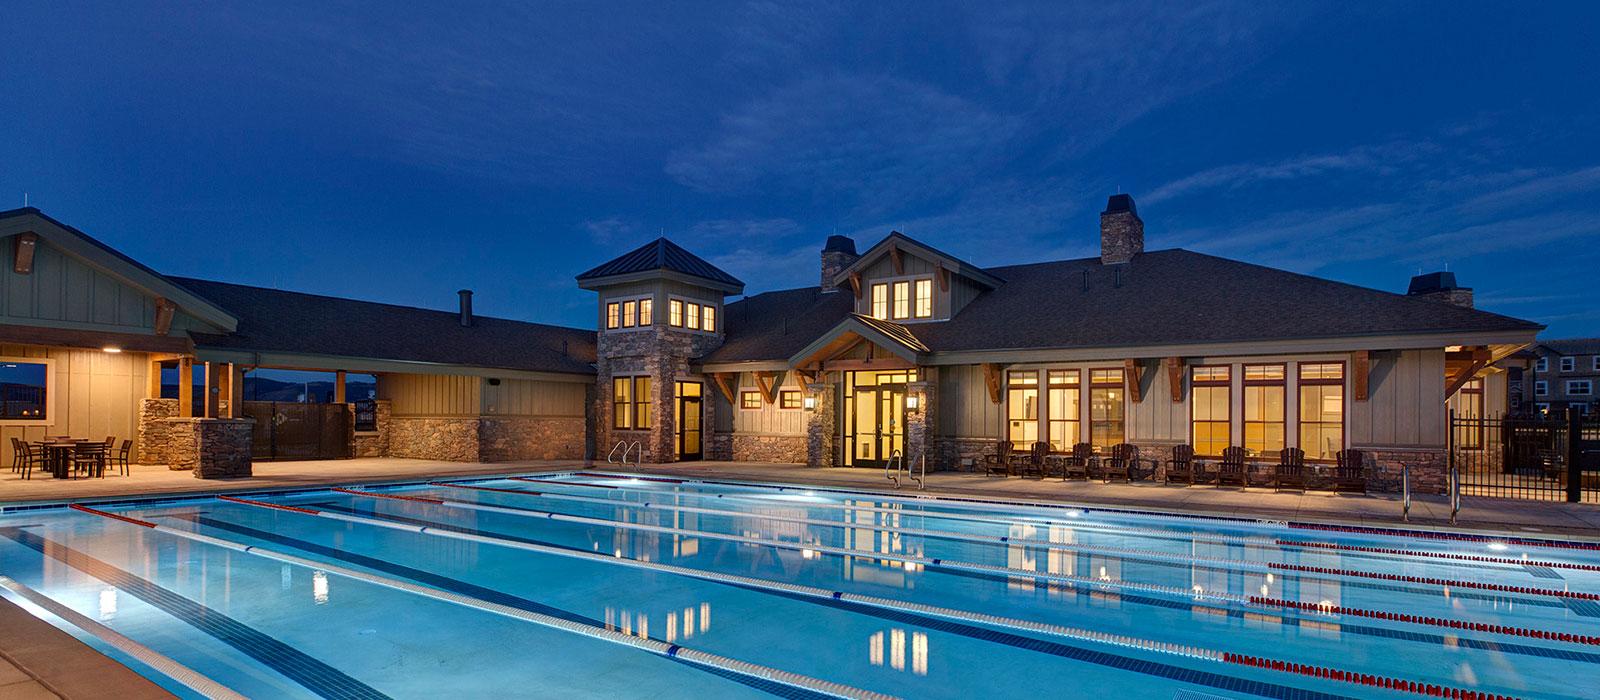 Candelas Swim and Fitness Club by KGA Studio Architects